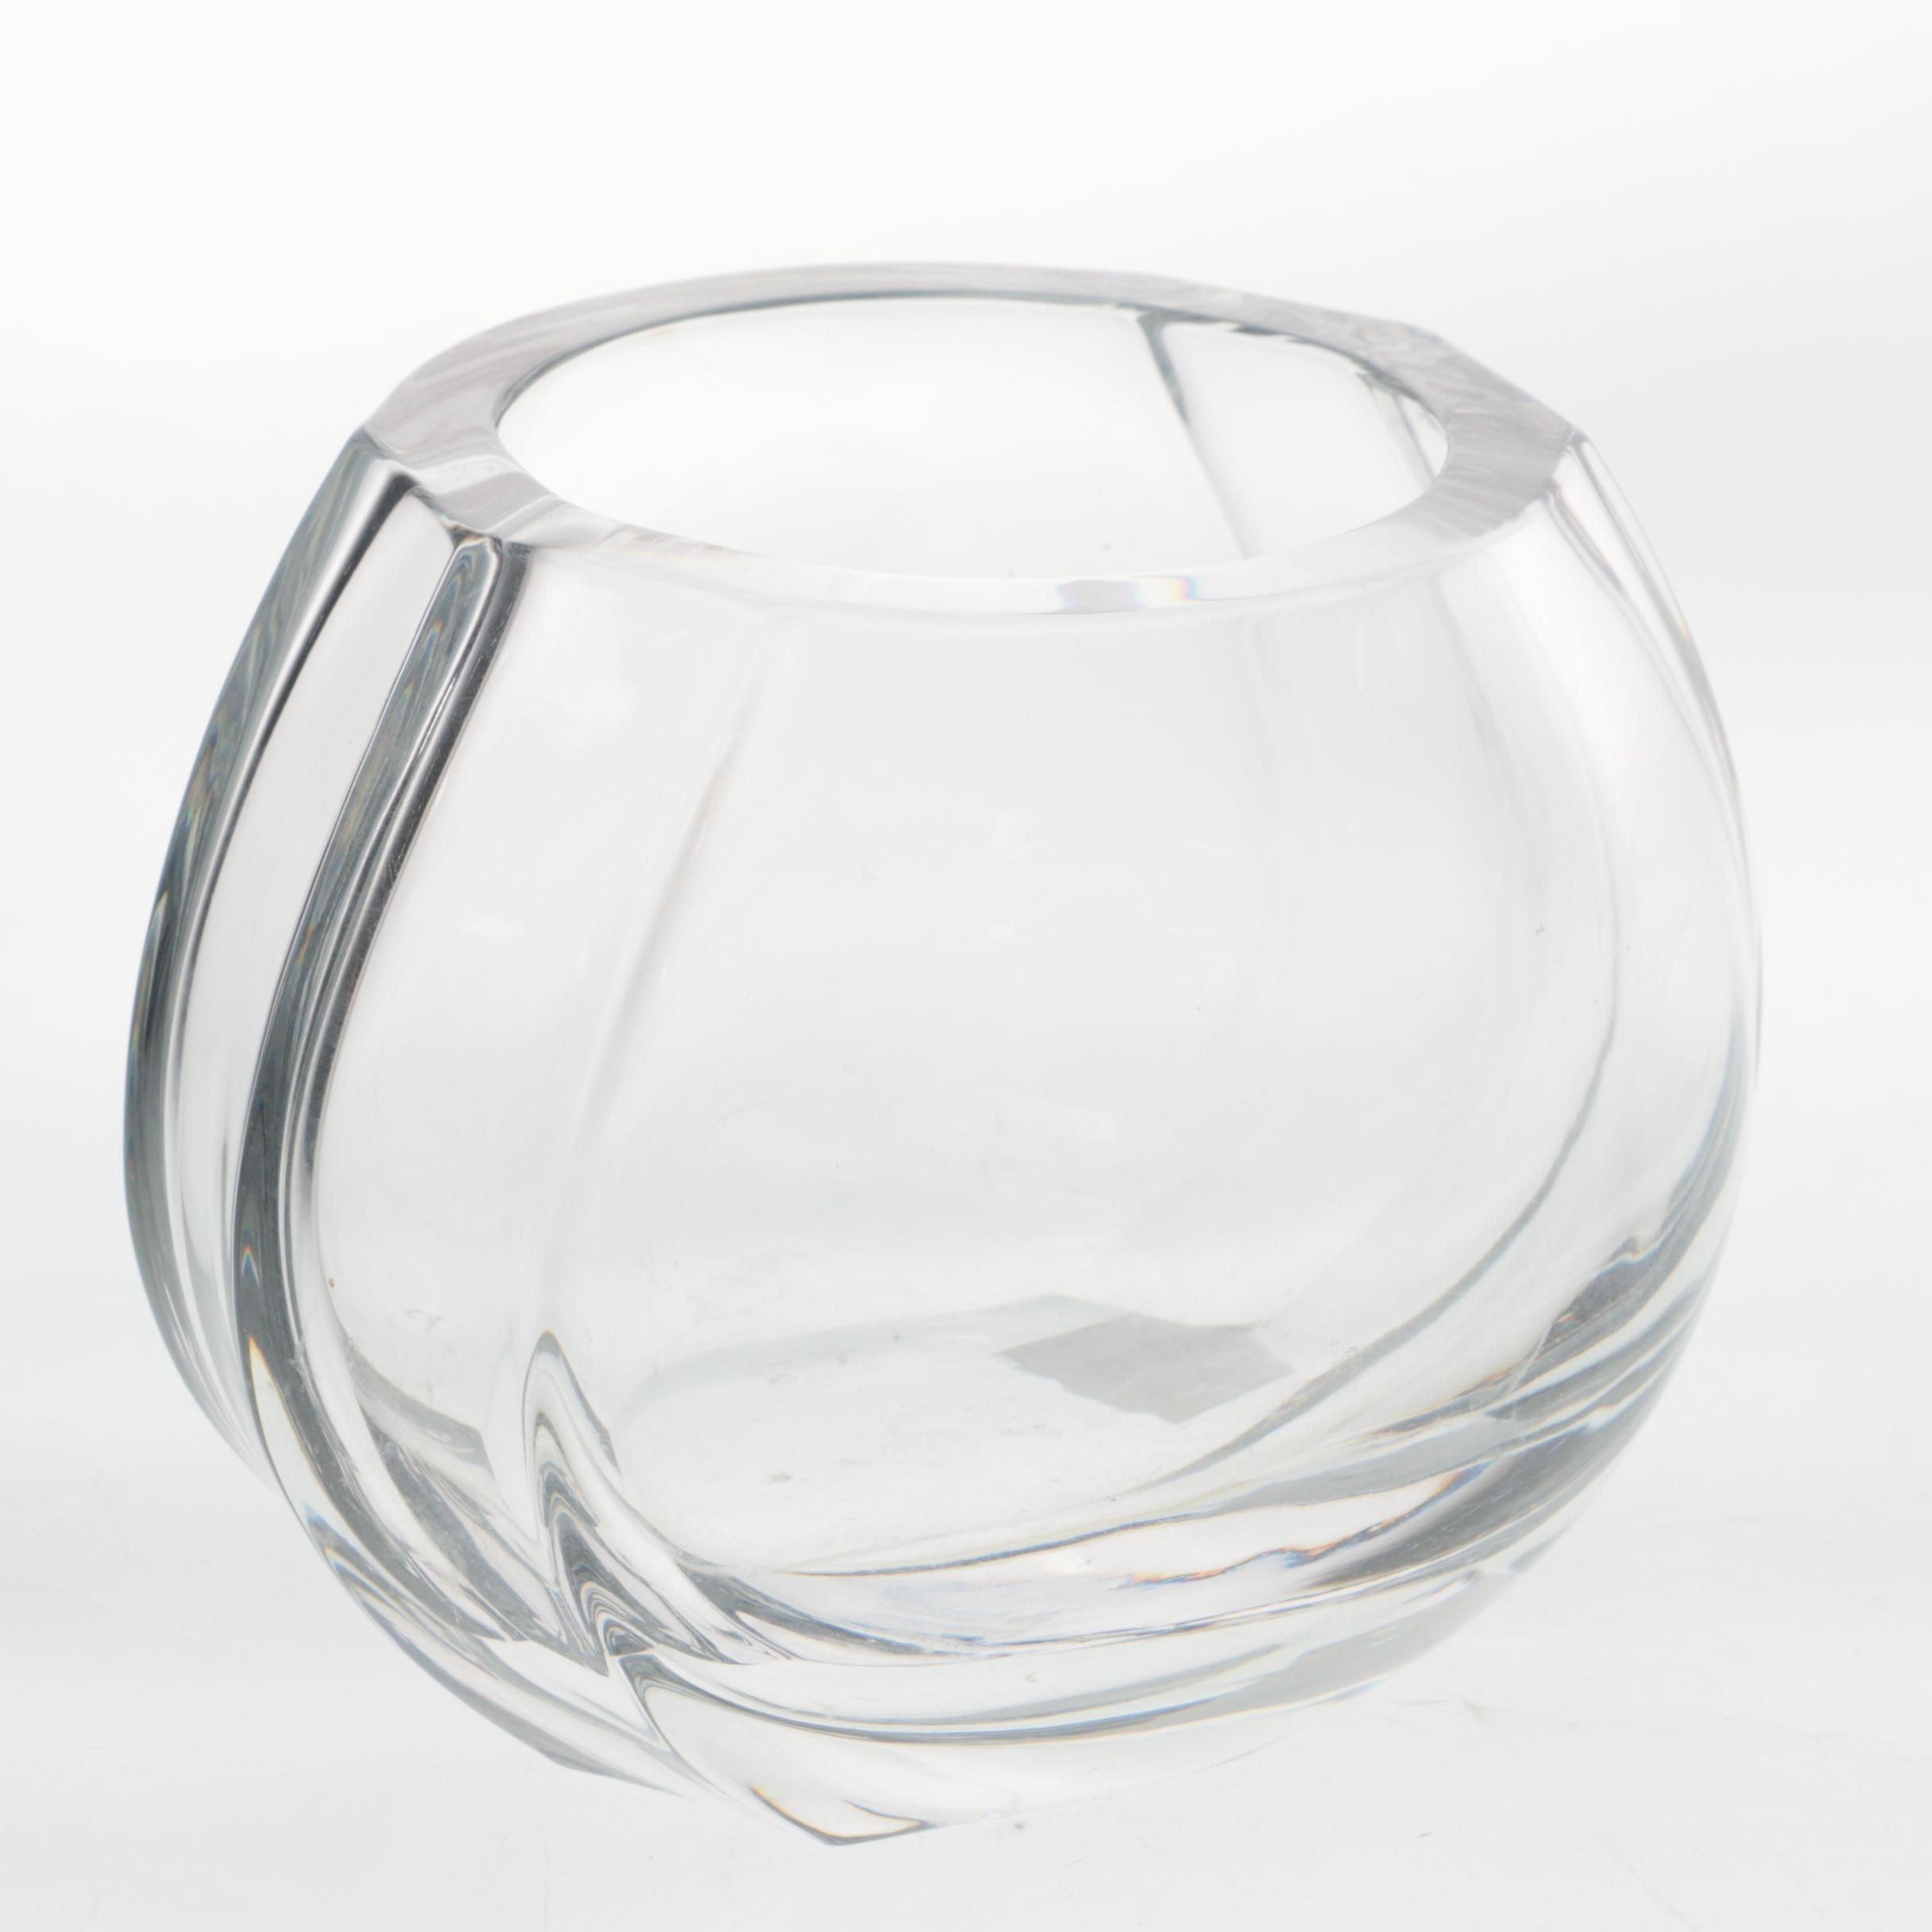 "Baccarat Crystal Vase ""Elysee"" Rose Bowl"